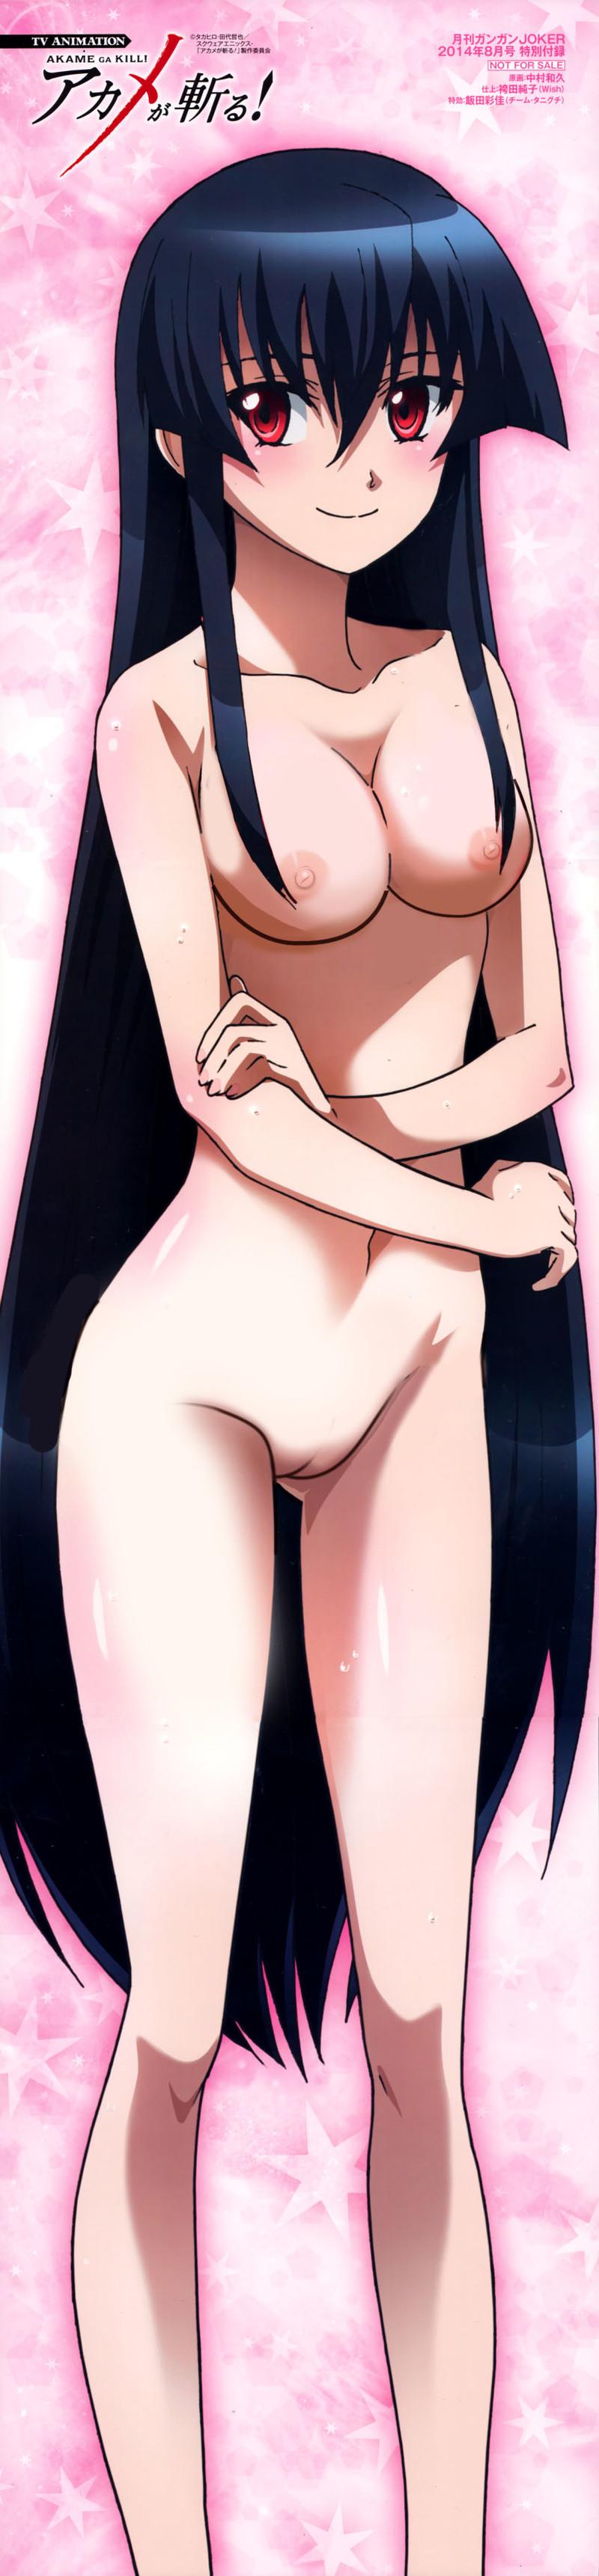 Akame Najenda Leone Chelsea Kurome Suzuka Esdeath Philip J. Fry Mez Tatsumi Mine 1415343 - Akame Akame_Ga_Kill! edit nekomate14.jpg